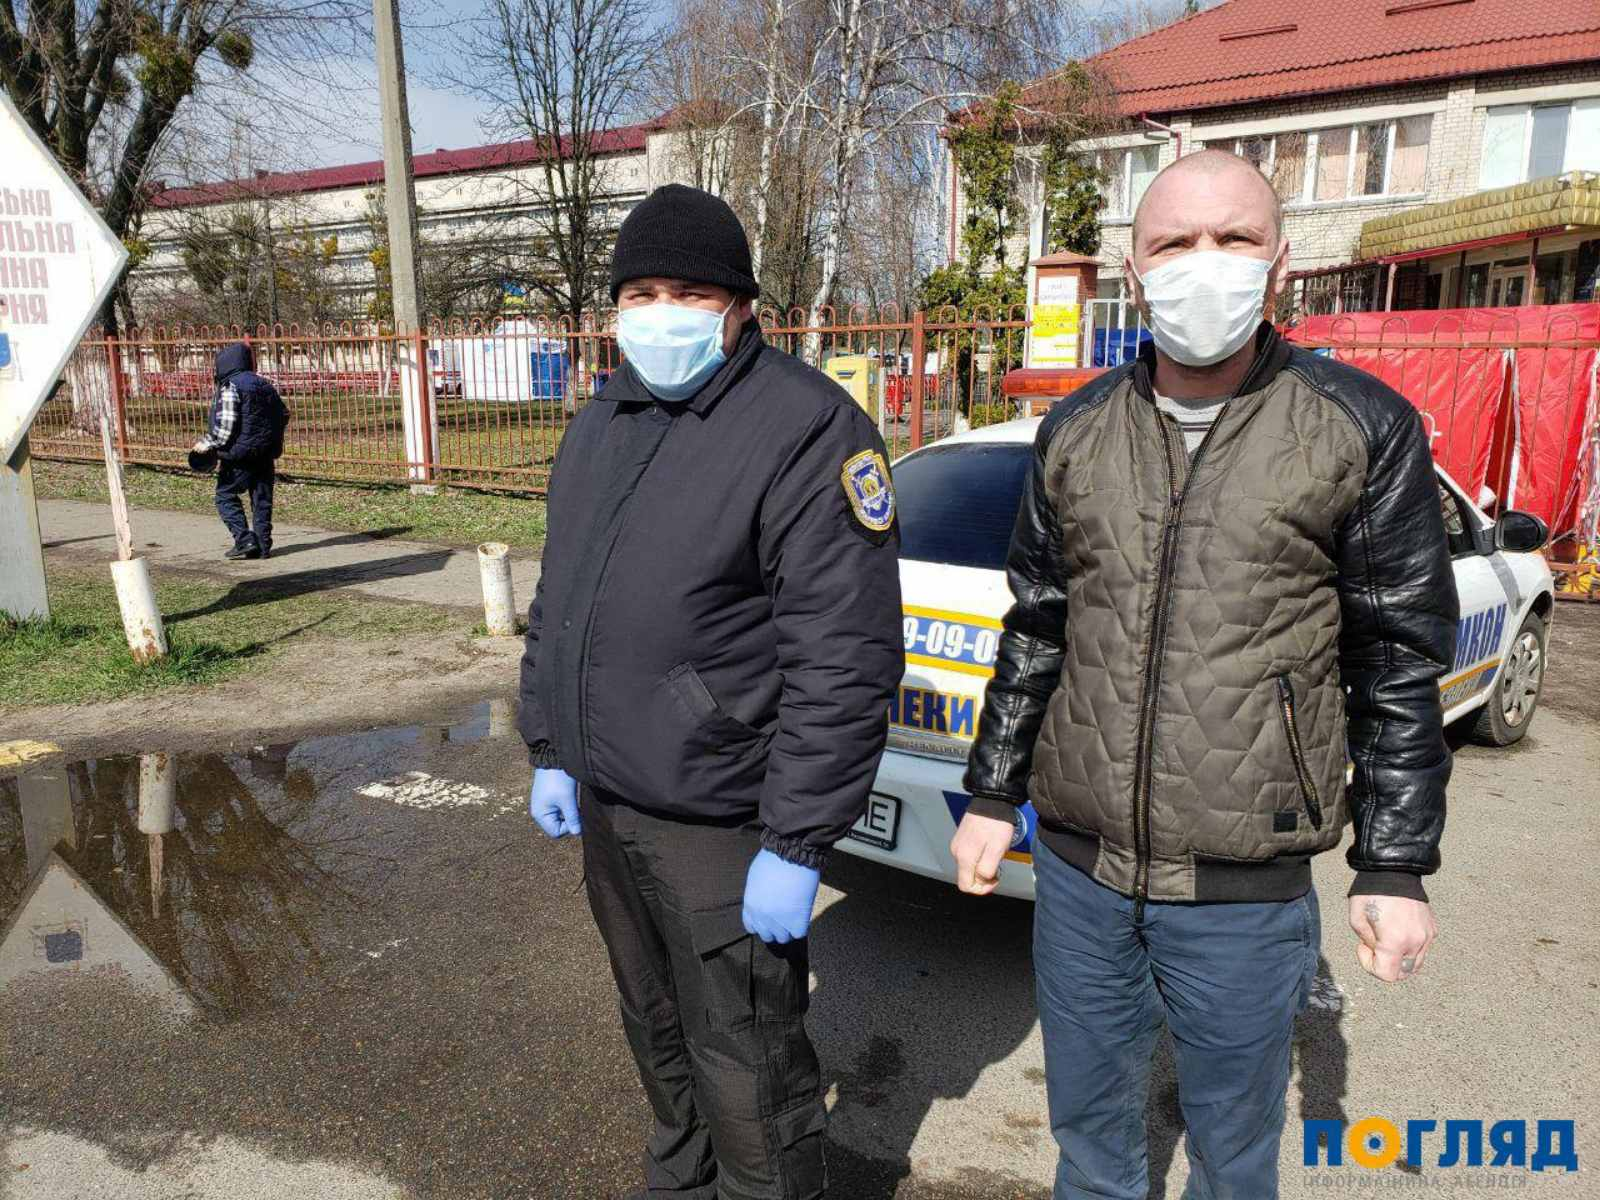 Через паркан швидше: у Броварах затримали порушника правил карантину -  - yzobrazhenye viber 2020 03 31 15 44 40